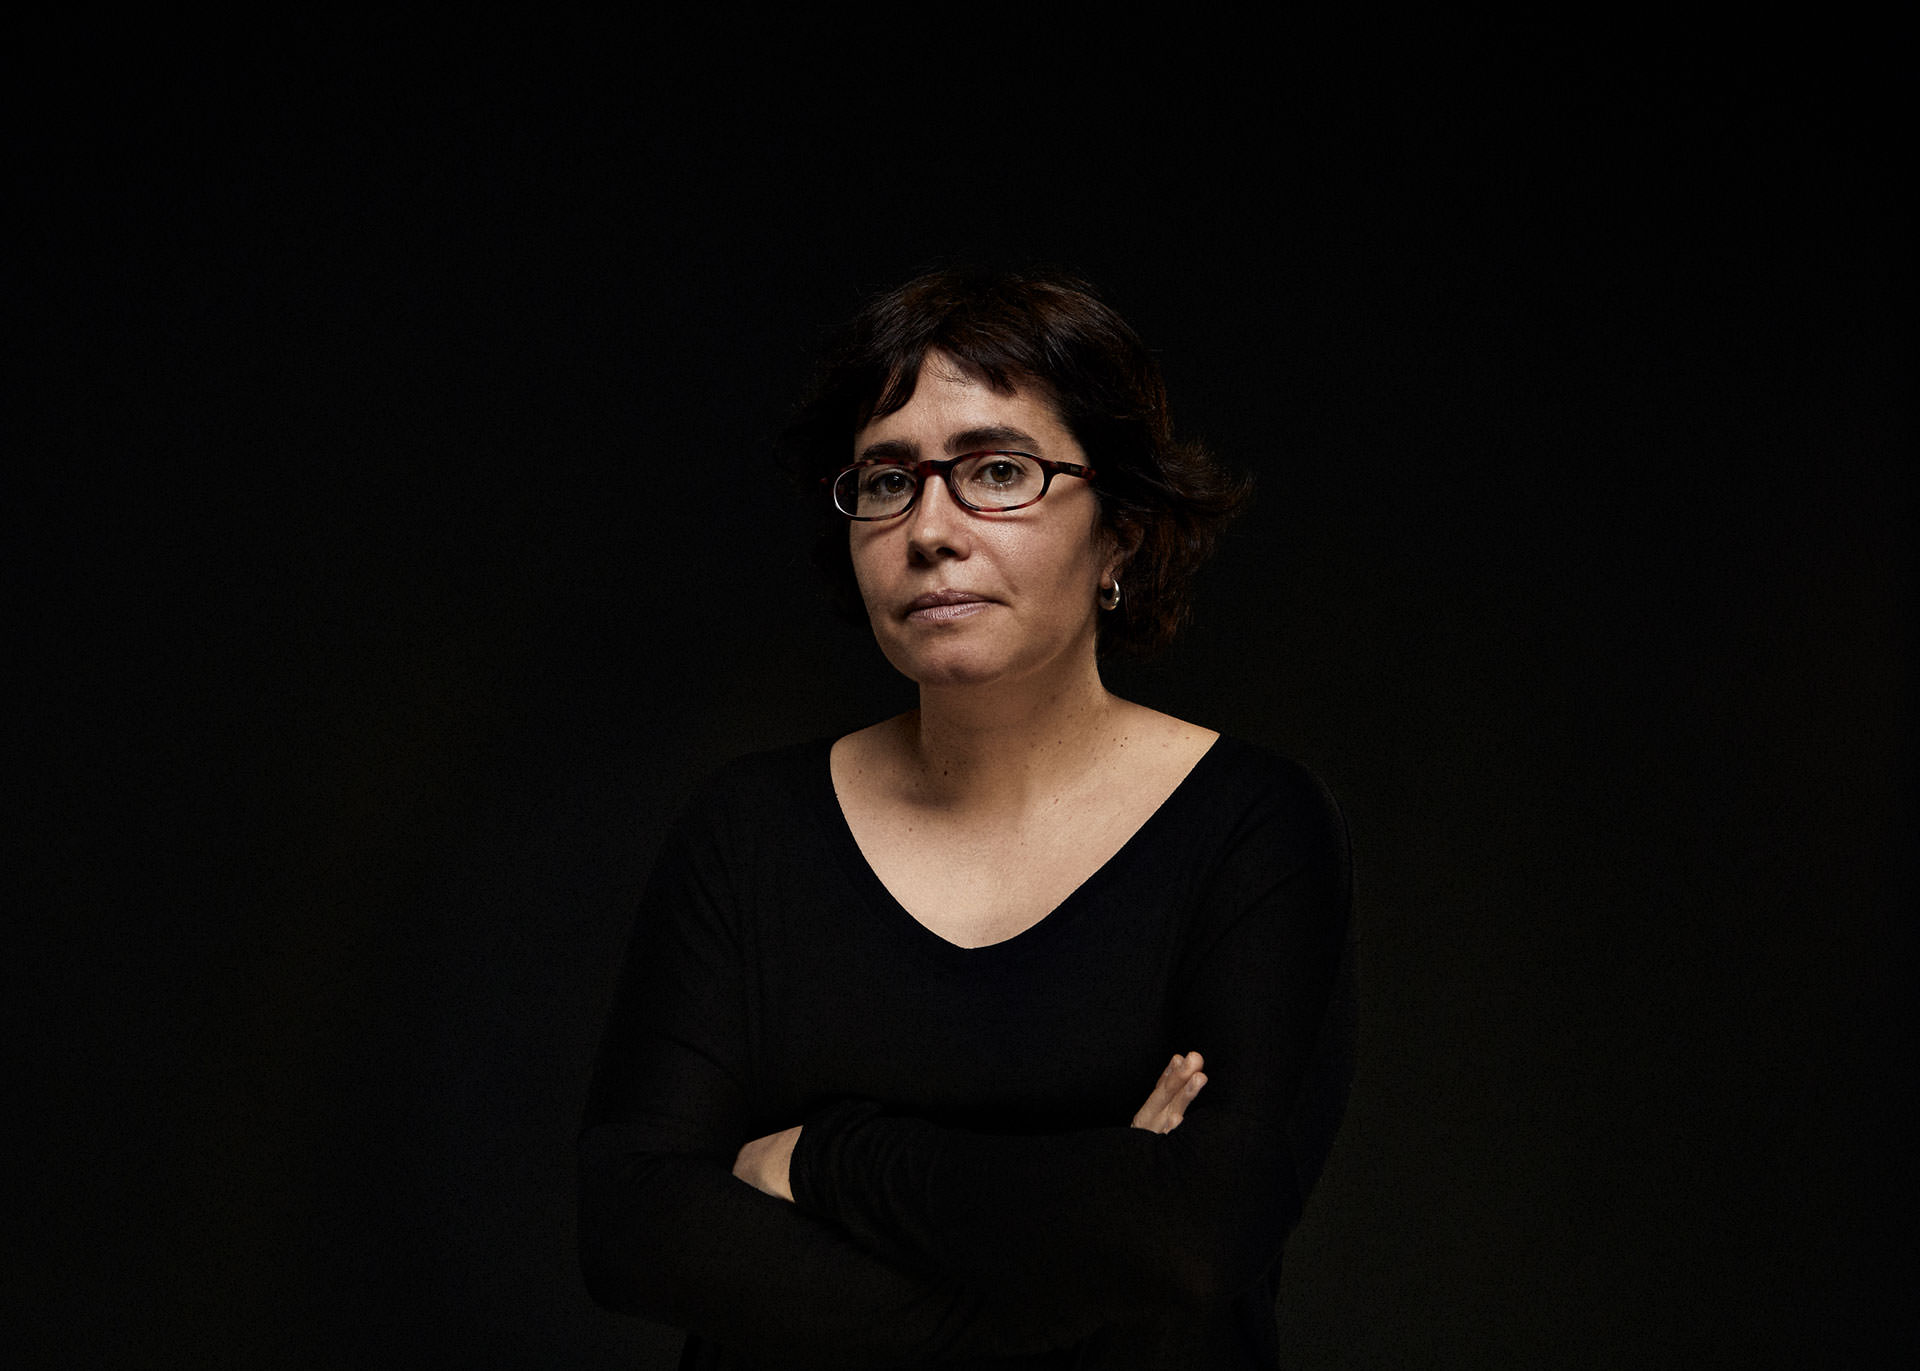 Marc Diez Portrait Photographer Barcelona Insikt Intelligence